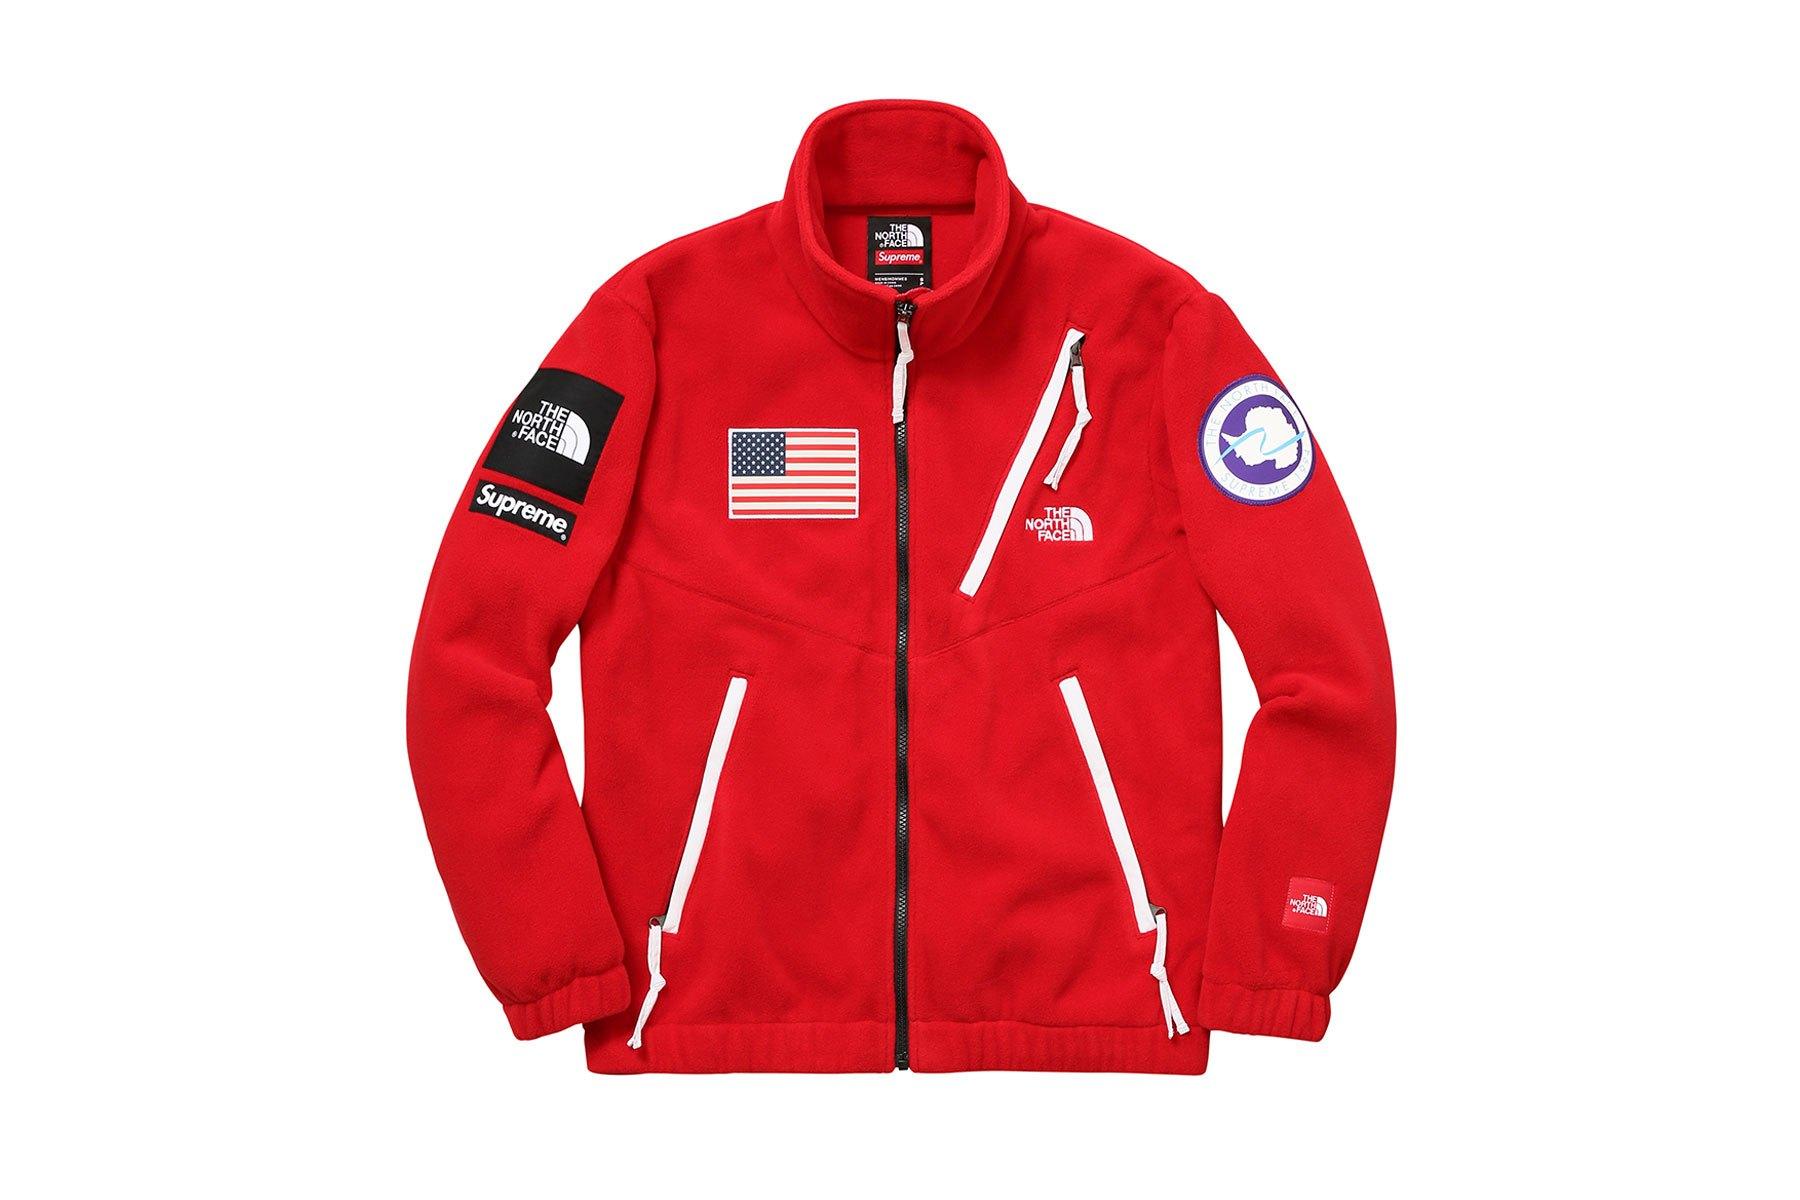 supreme-the-north-face-2017-spring-summer-red-polartec-fleece-jacket-26